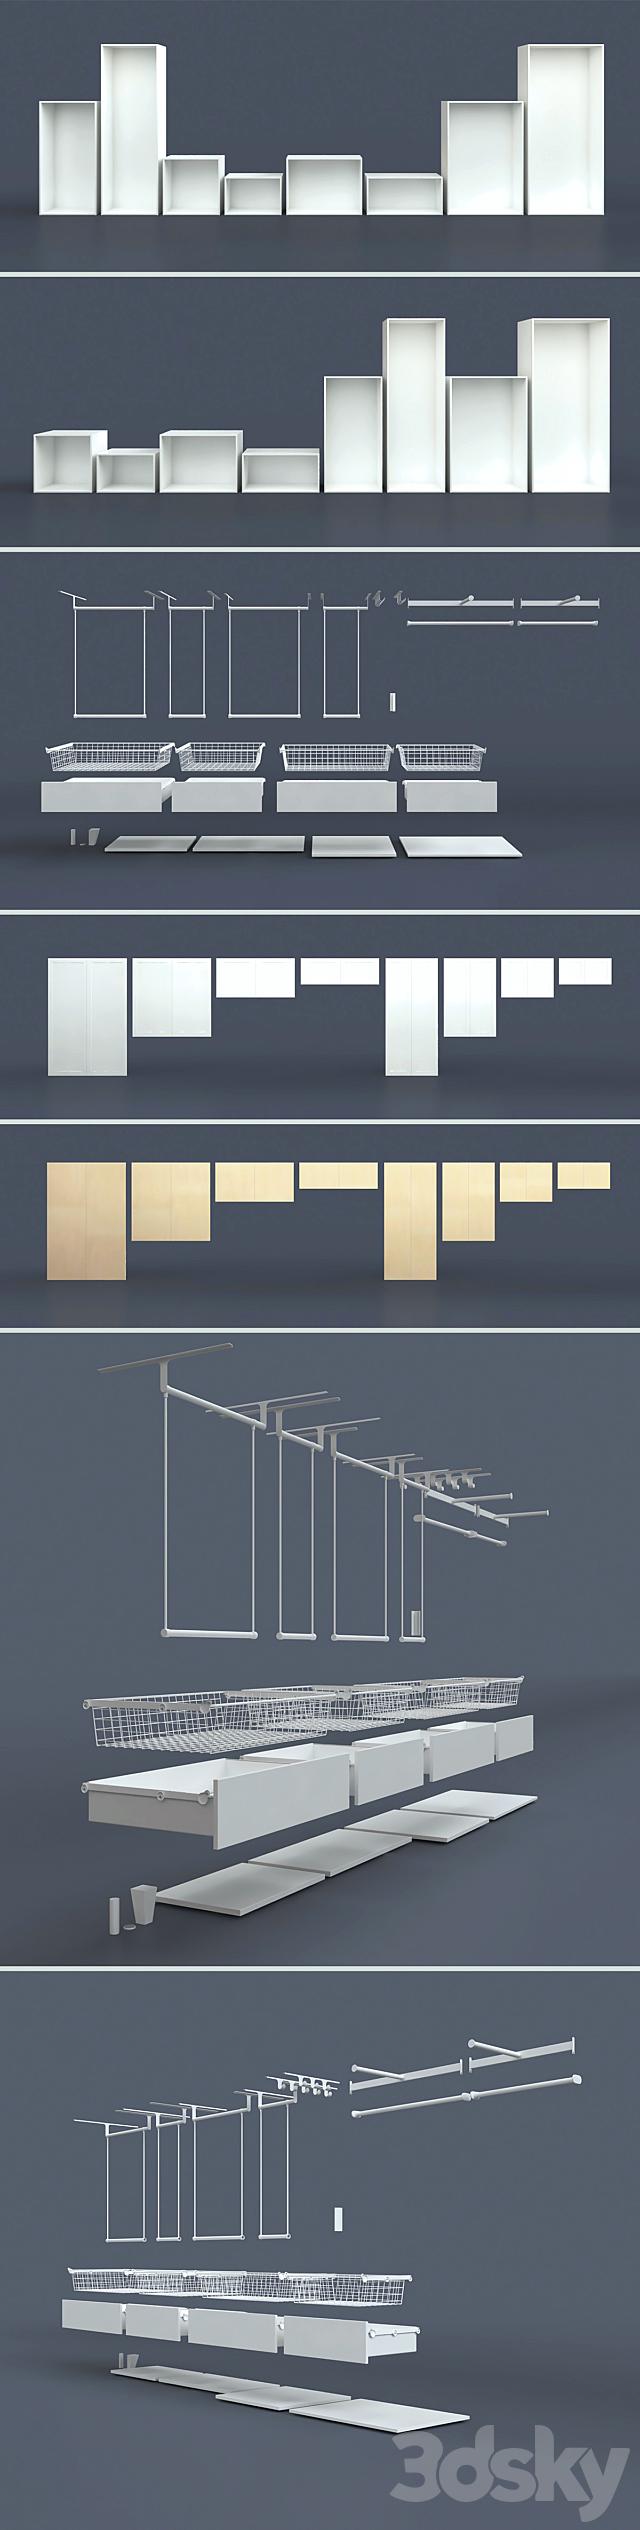 Modular system of IKPAS / Platsa (designer).